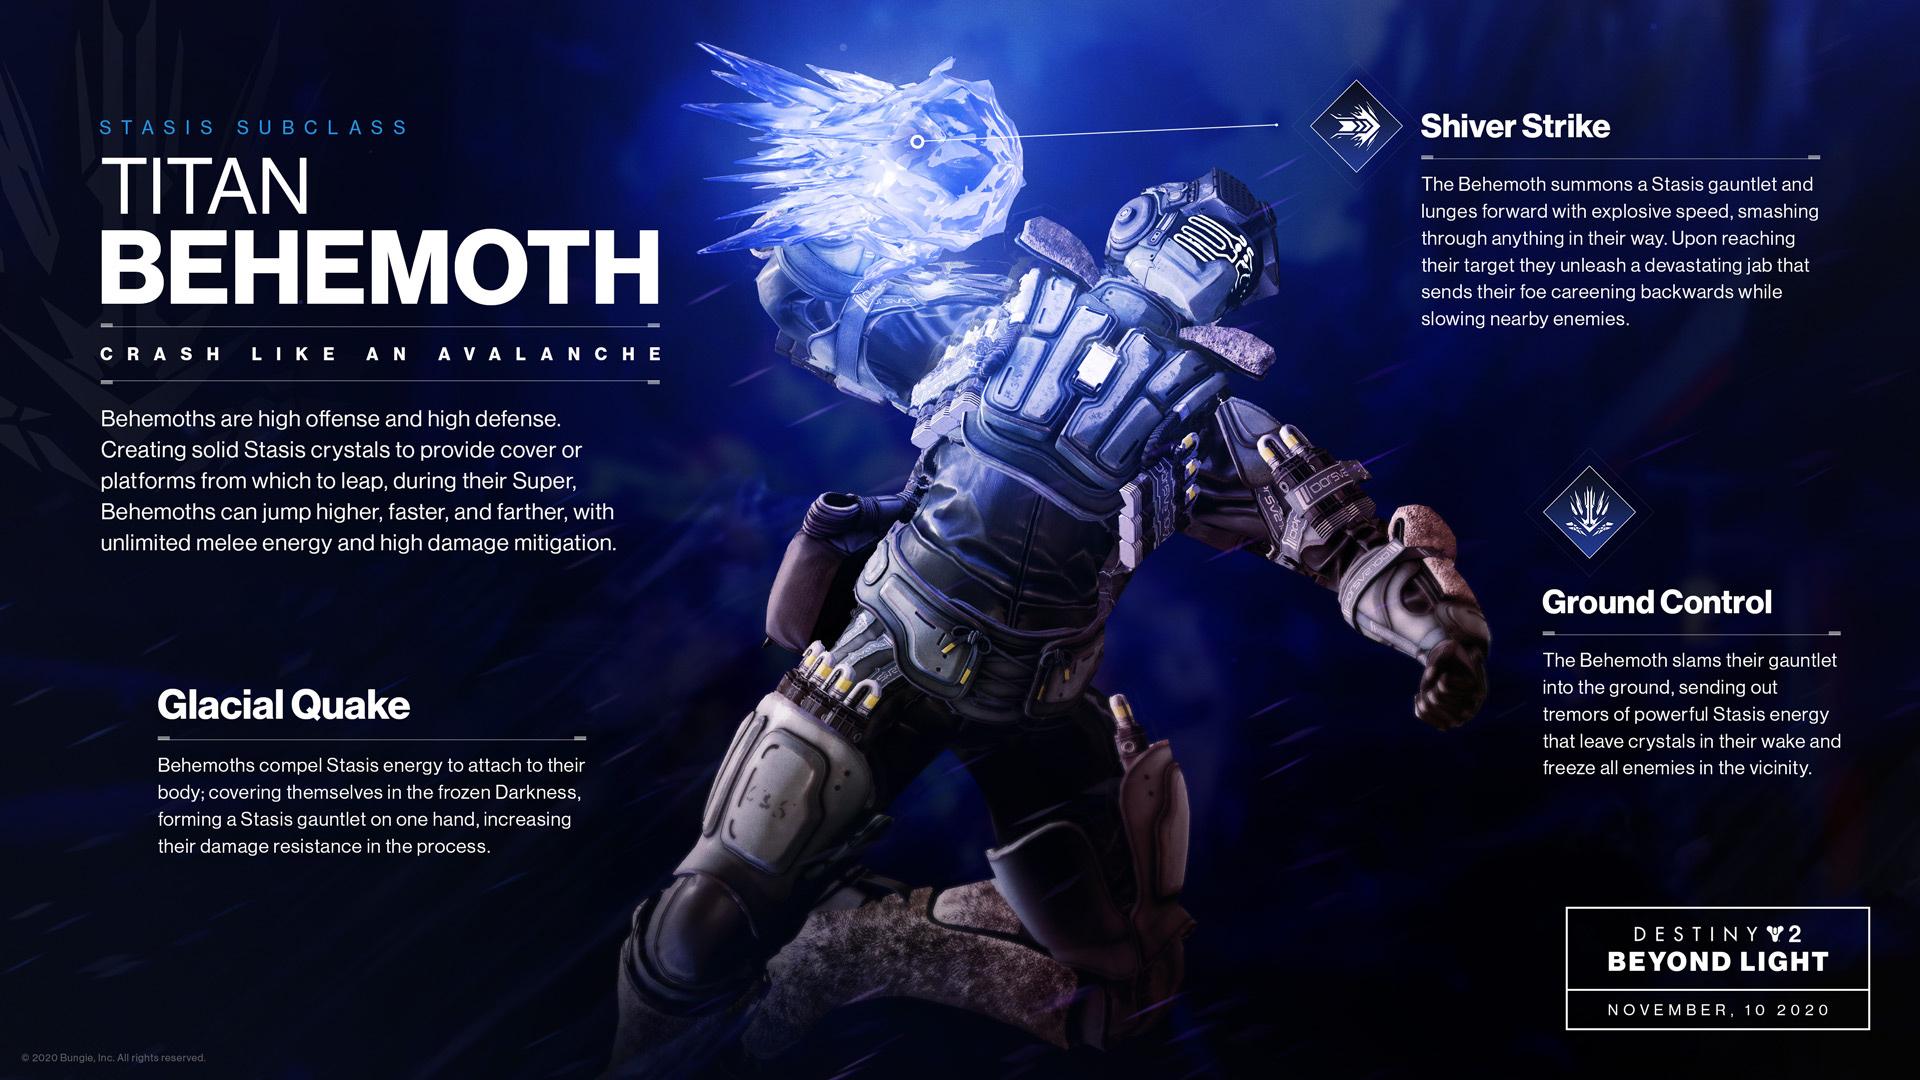 Destiny 2 Titan Behemoth